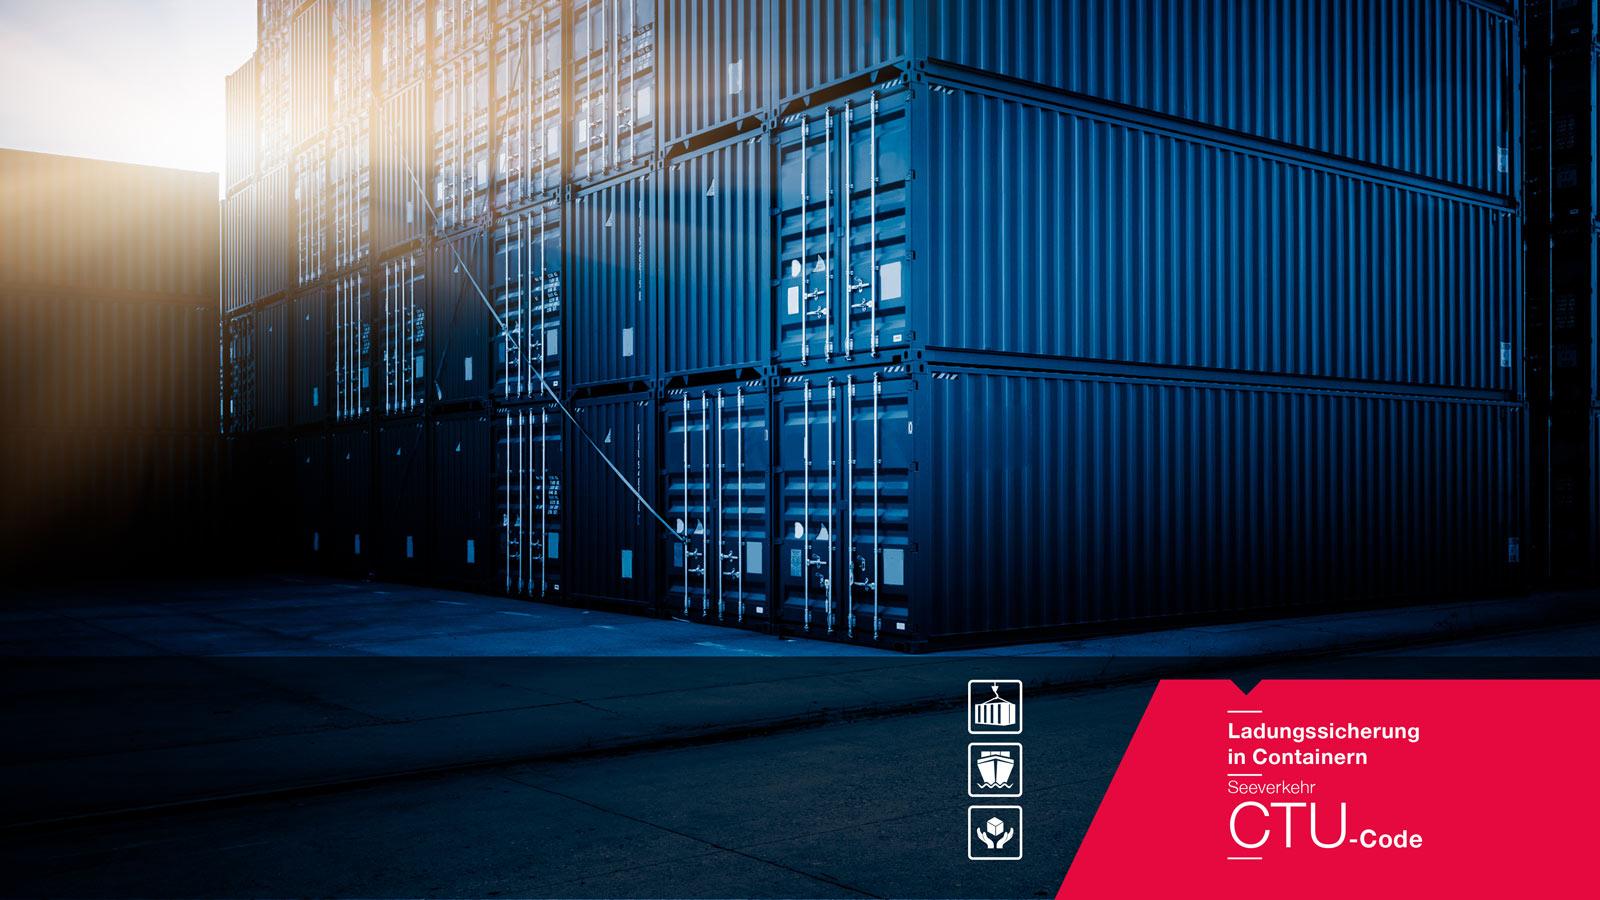 Ladungssicherung in Containern – Seeverkehr /CTU-Code